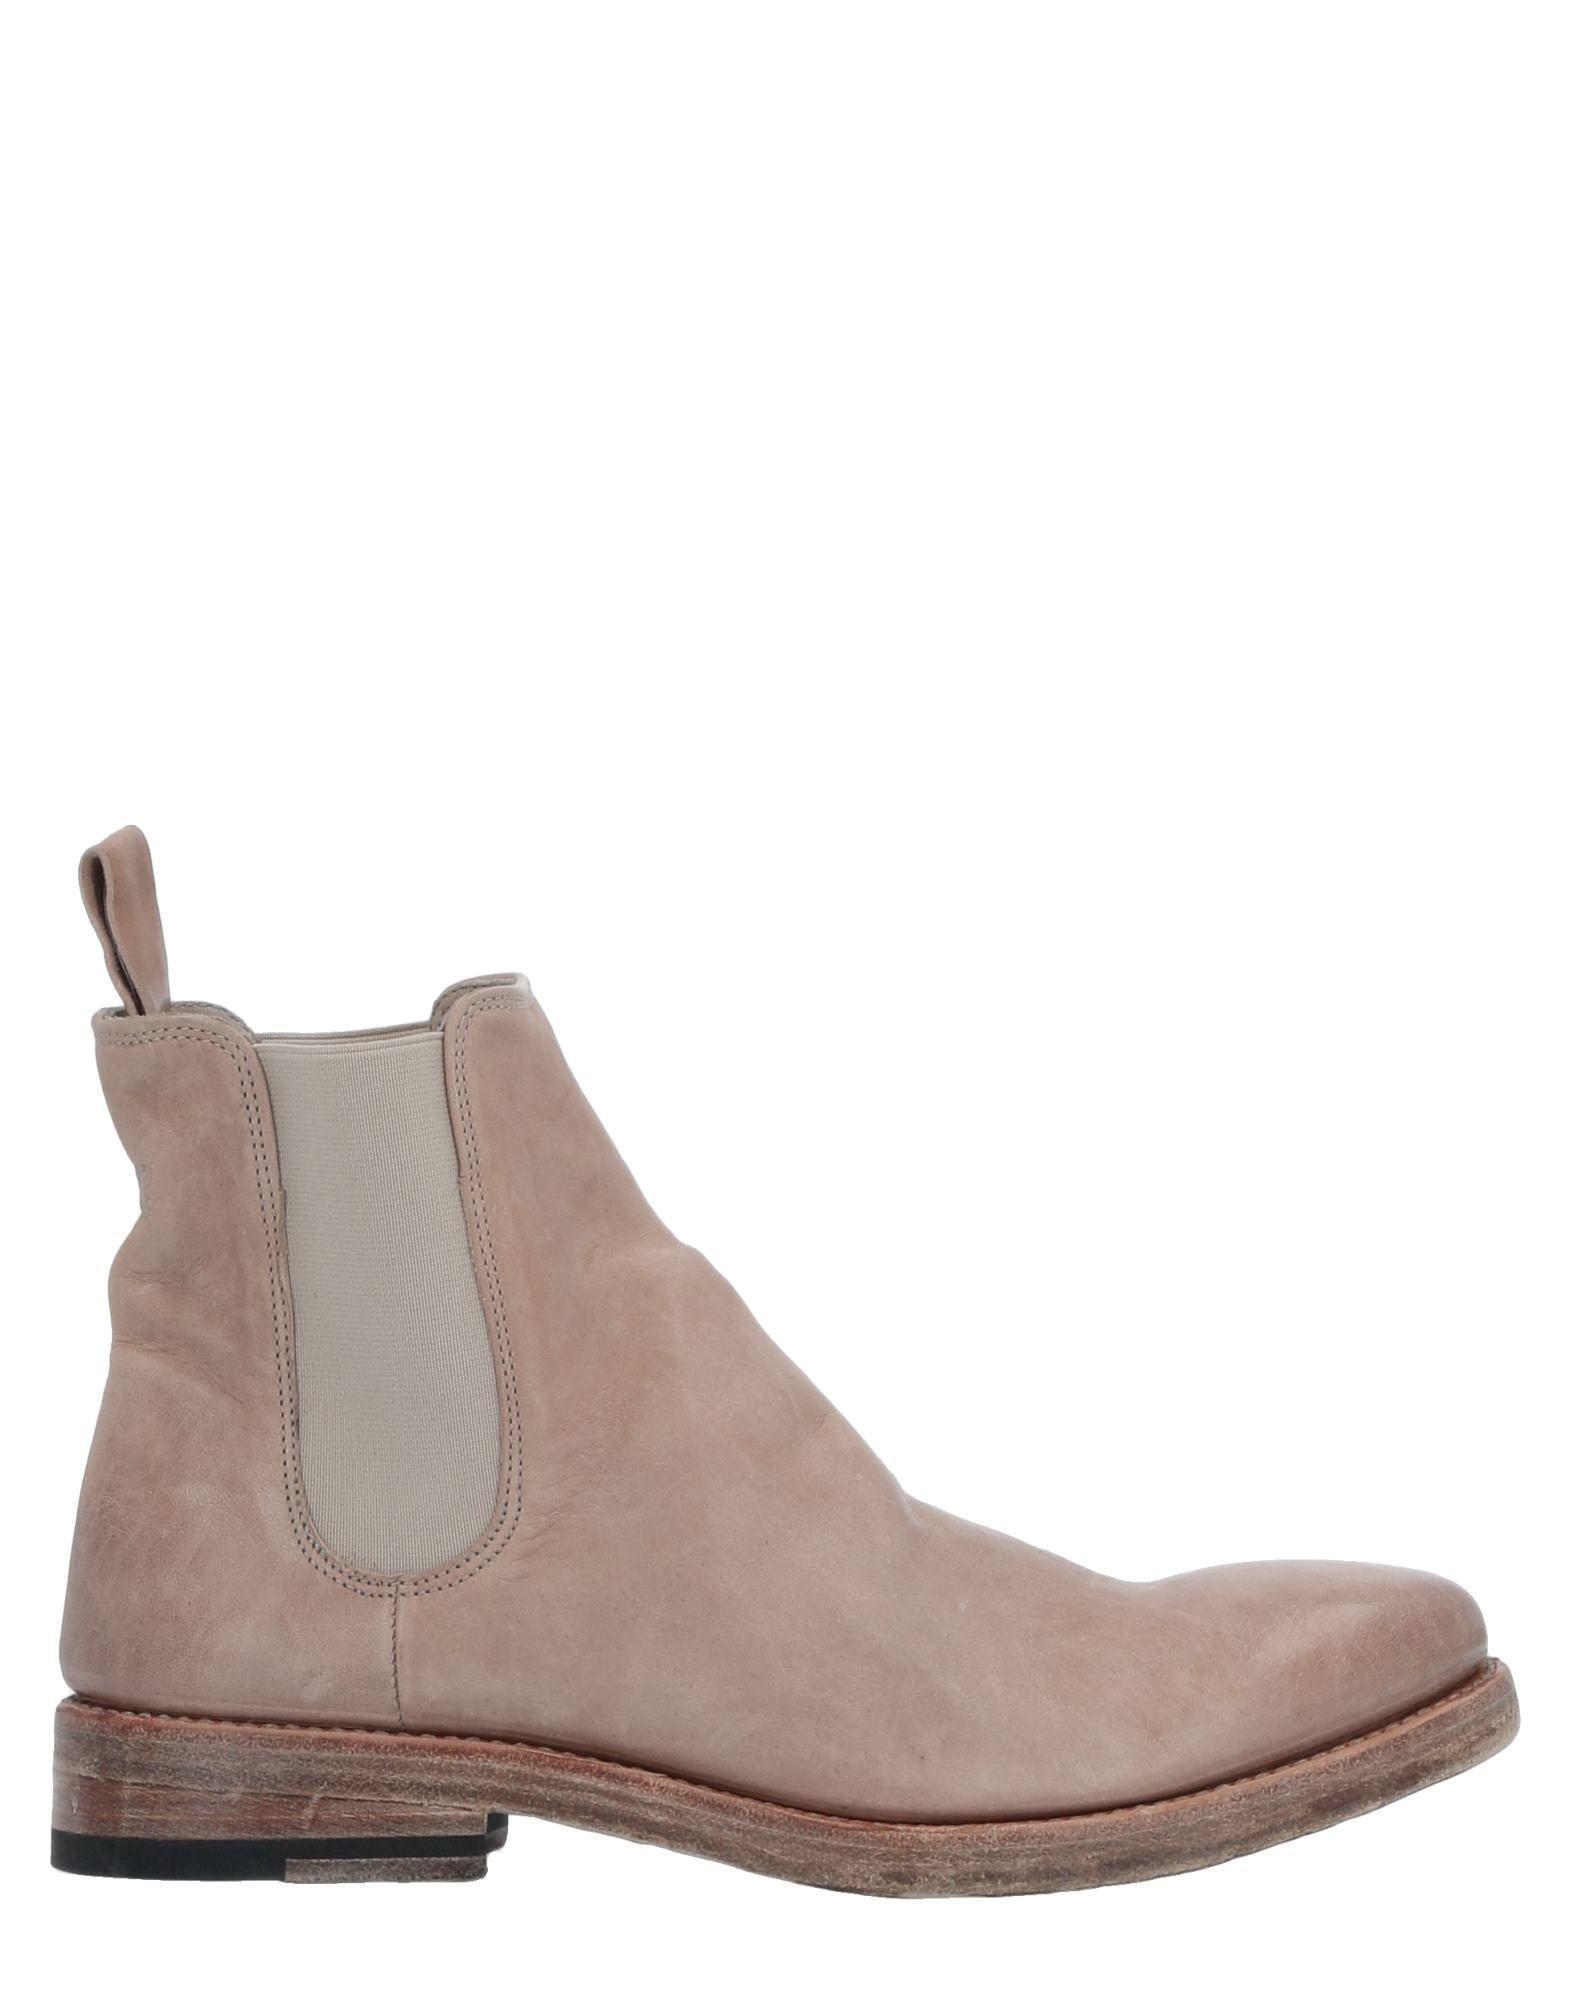 Rabatt Schuhe The Last Conspiracy Chelsea Boots Damen  11517289GG